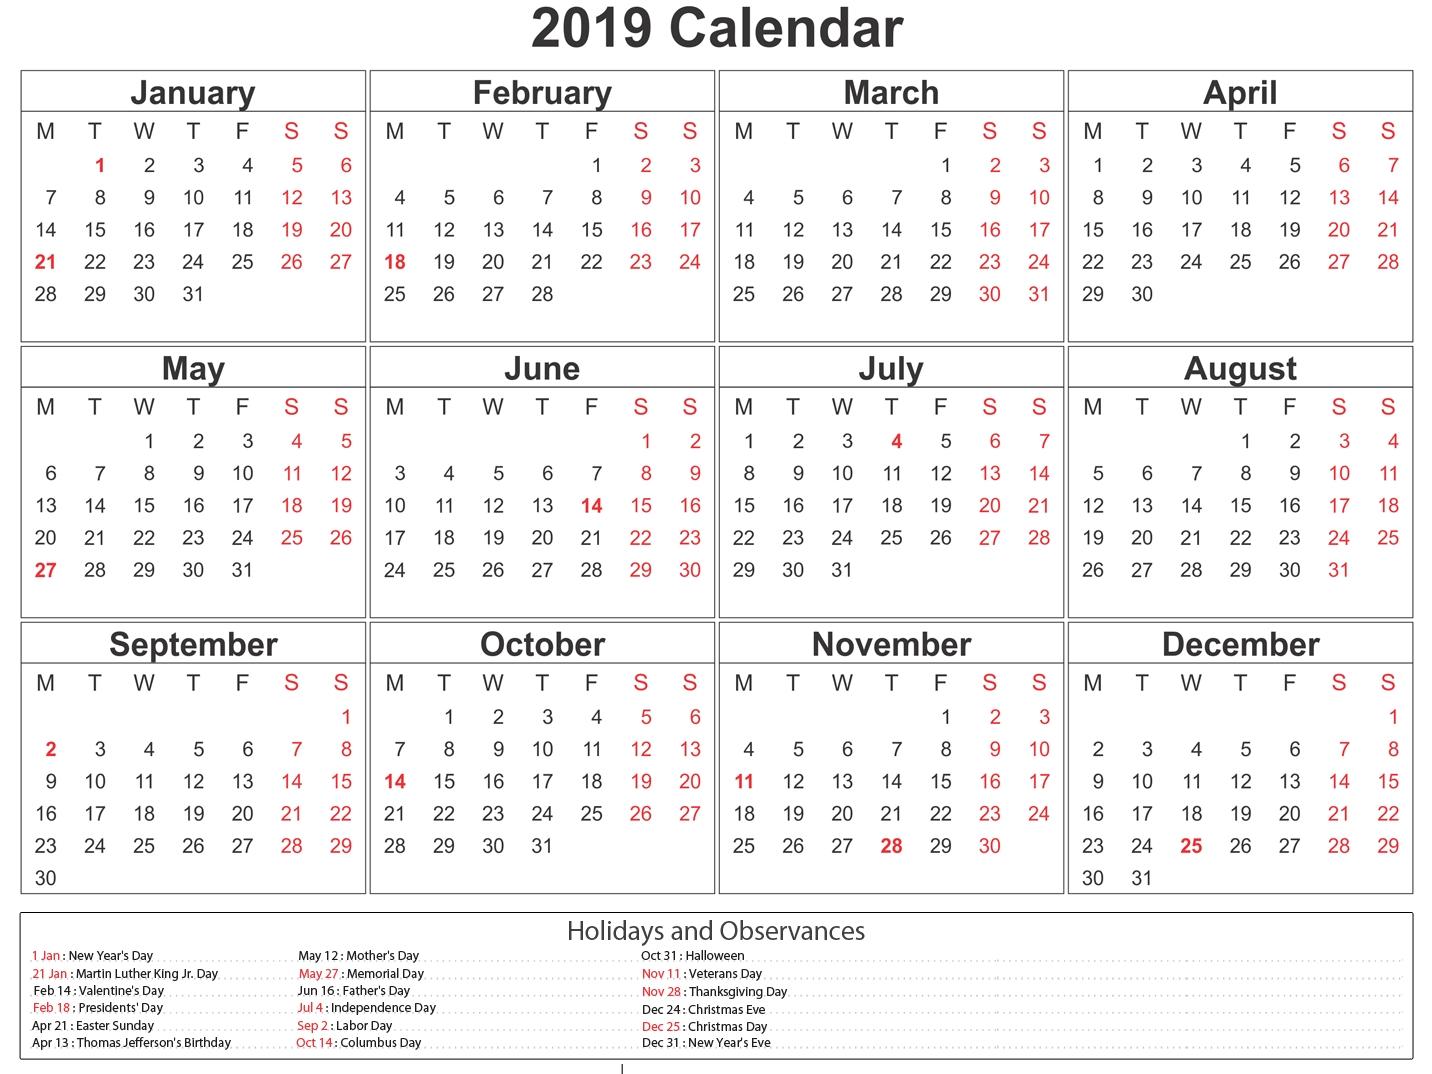 Printable South Africa 2019 Calendar #southafrica #calendar Year 2020 Calender - South Africa